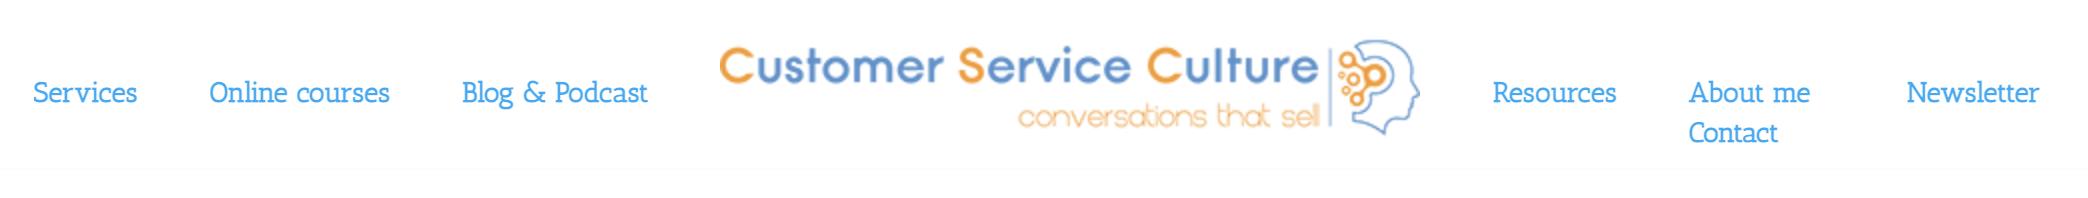 Customer Service Culture EN